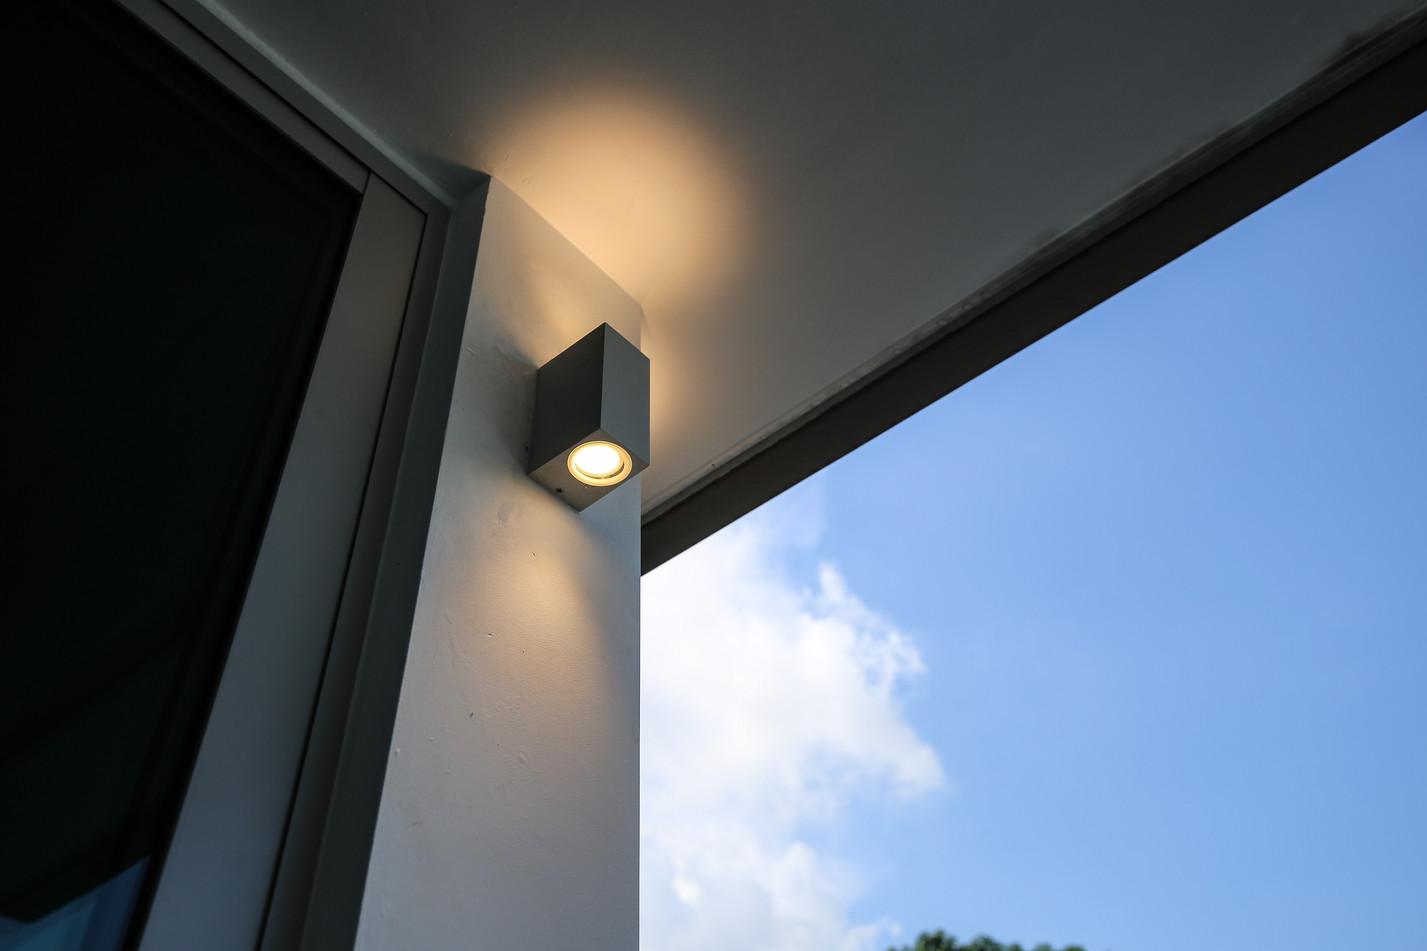 LED GU10 Wall light